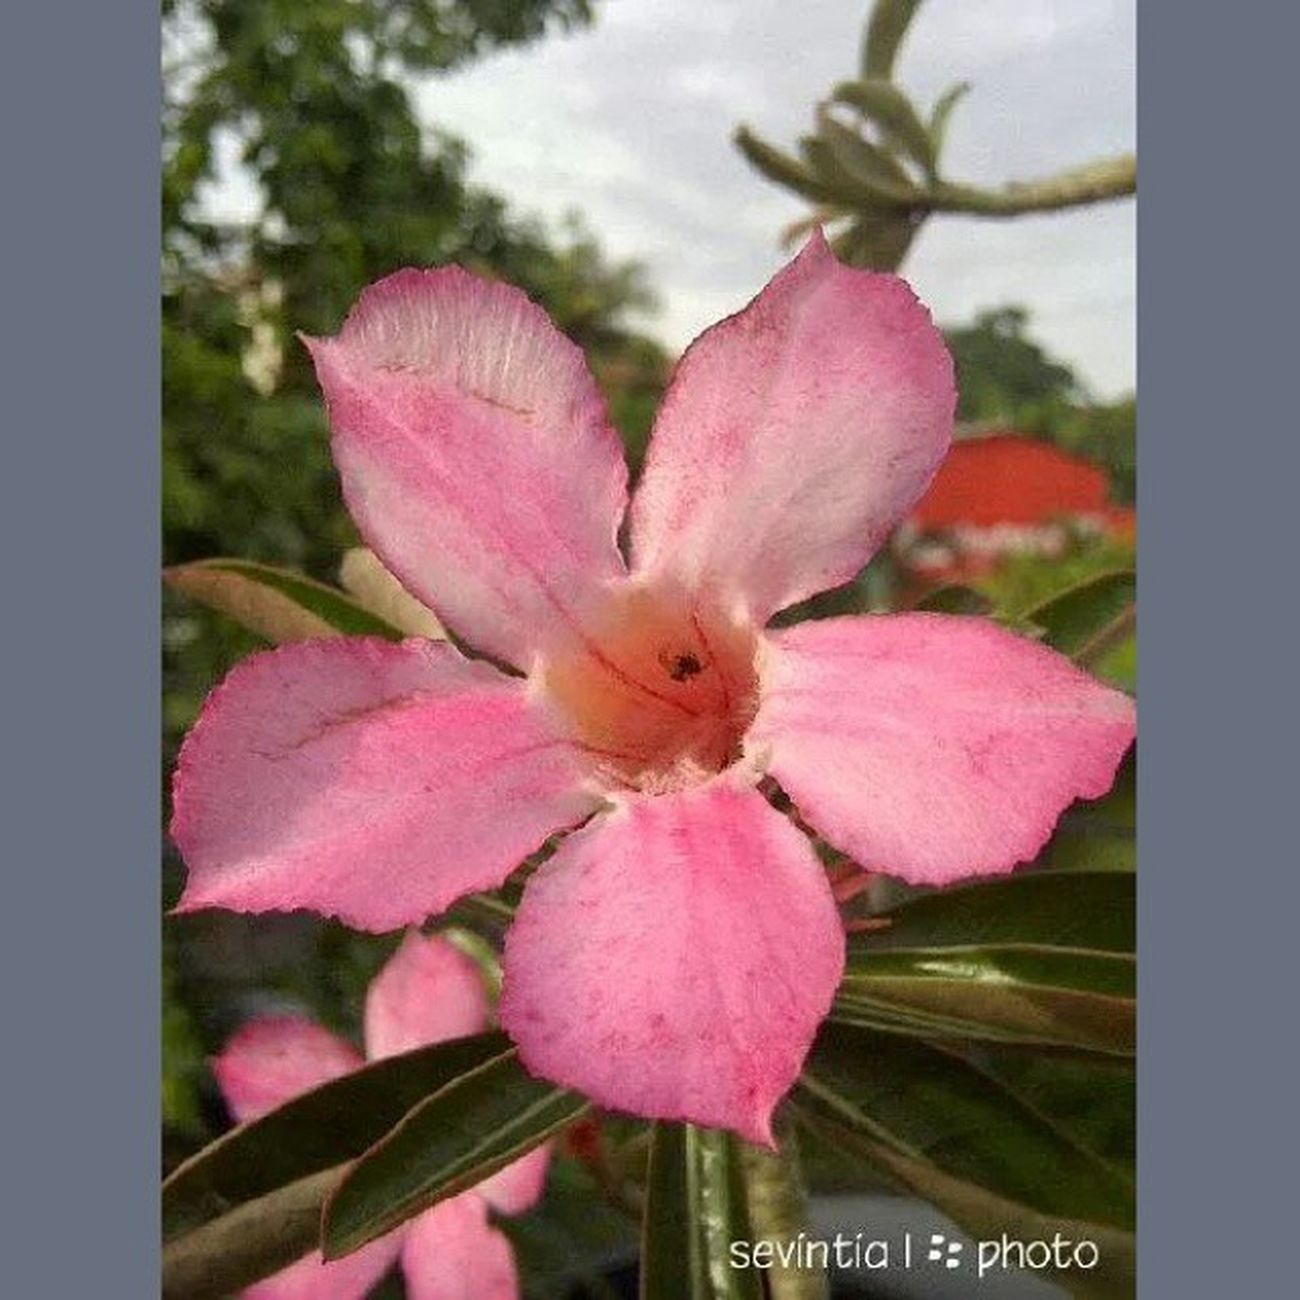 Flower again <3 Flower Blackberrycamera Blackberrymonza Blackberry9860 justashot latepost lateupload